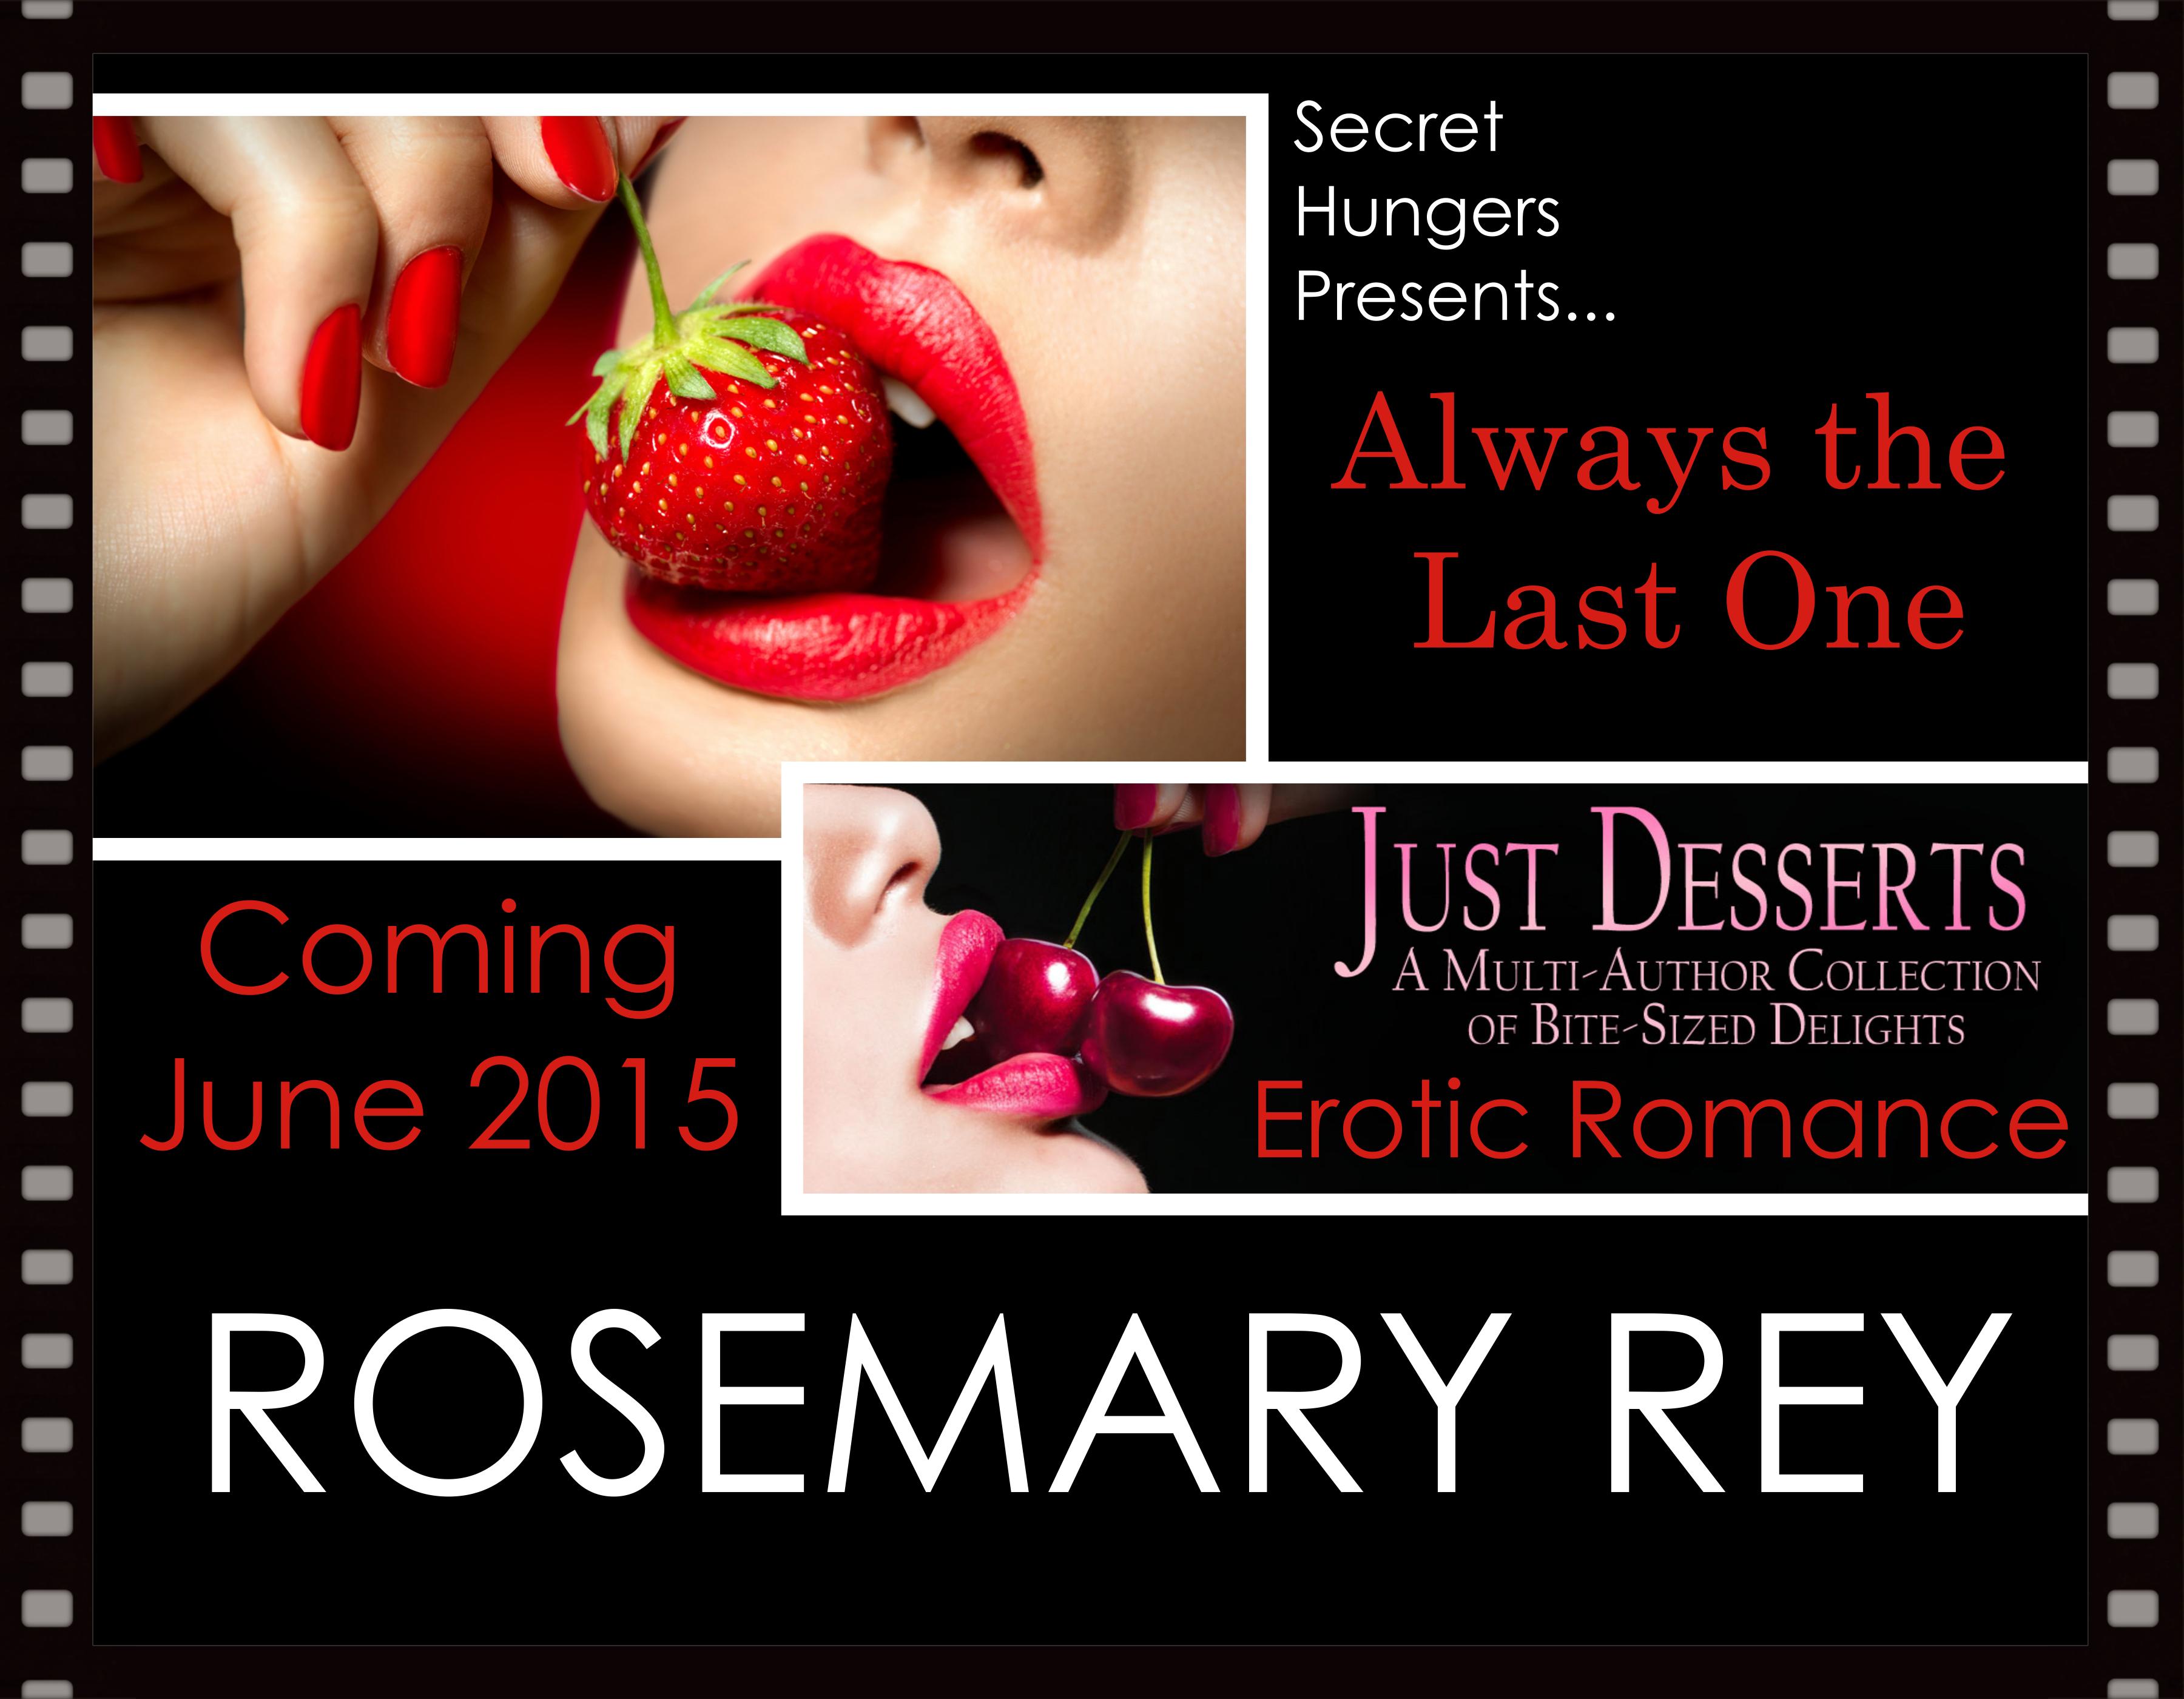 Rosemary_Rey_edit_Final